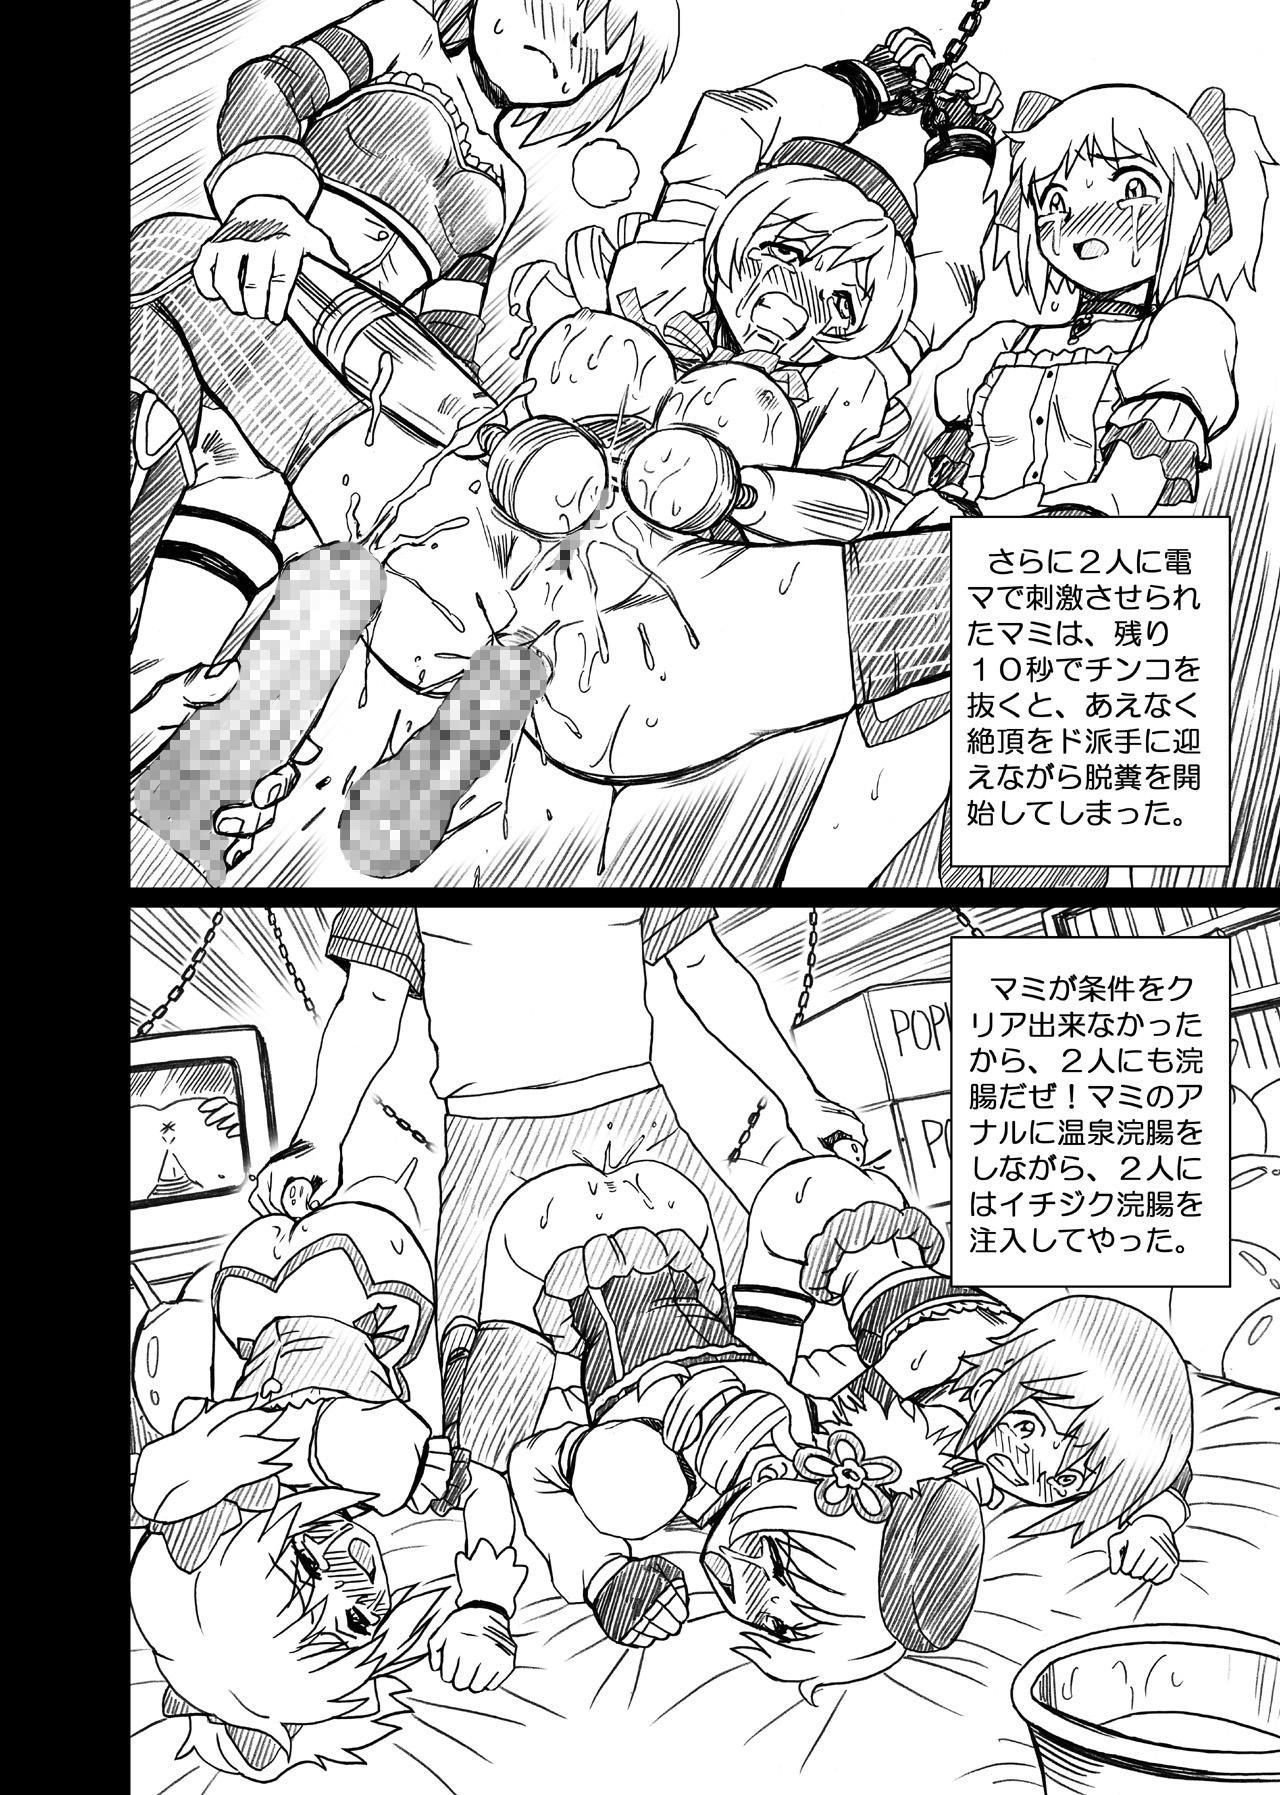 """Mado★Magi"" Anal & Scatolo Sakuhinshuu 49"